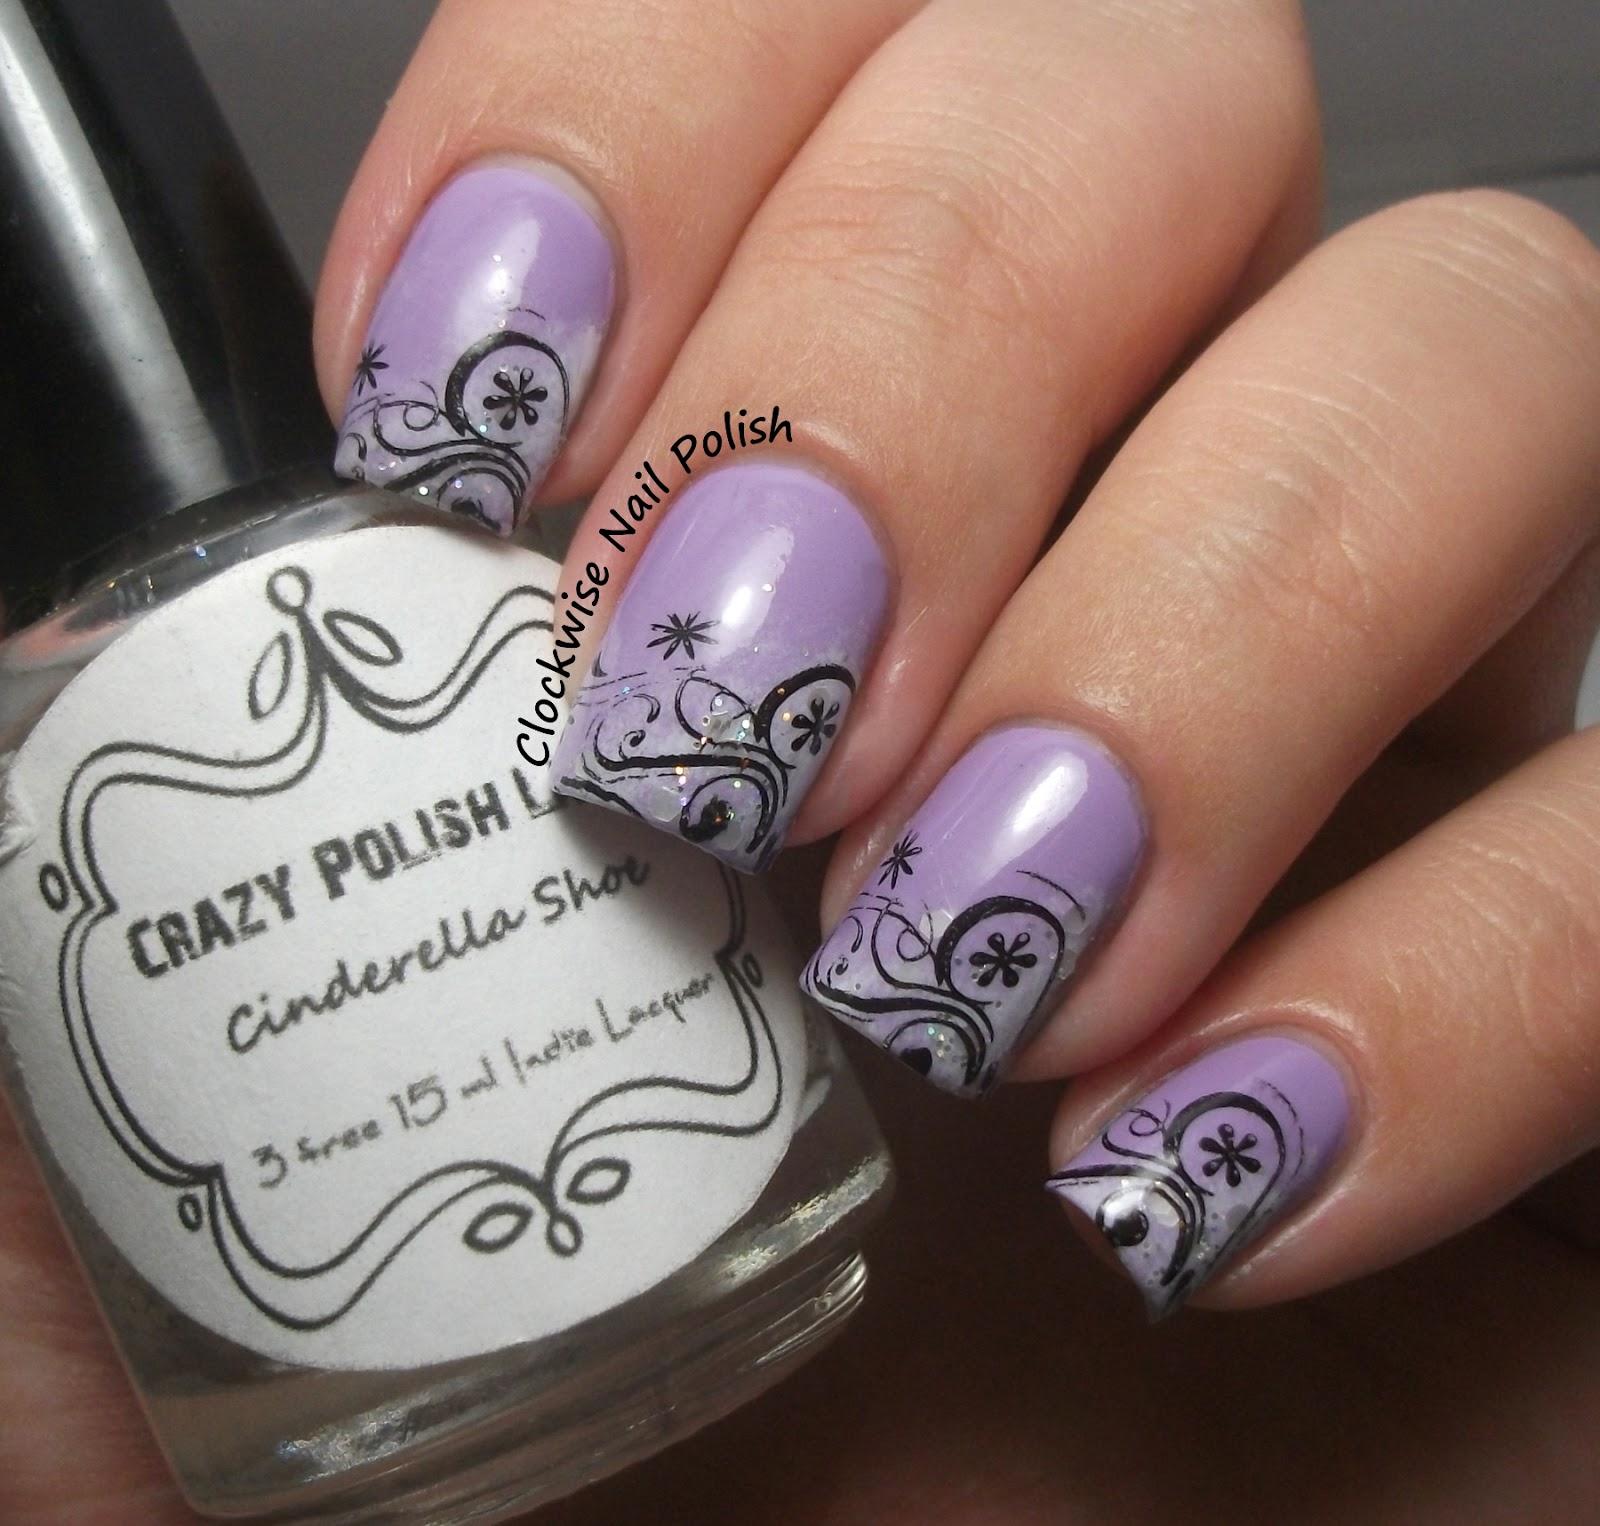 Pro Nail Designs: The Clockwise Nail Polish: Purple Professional 103 Love